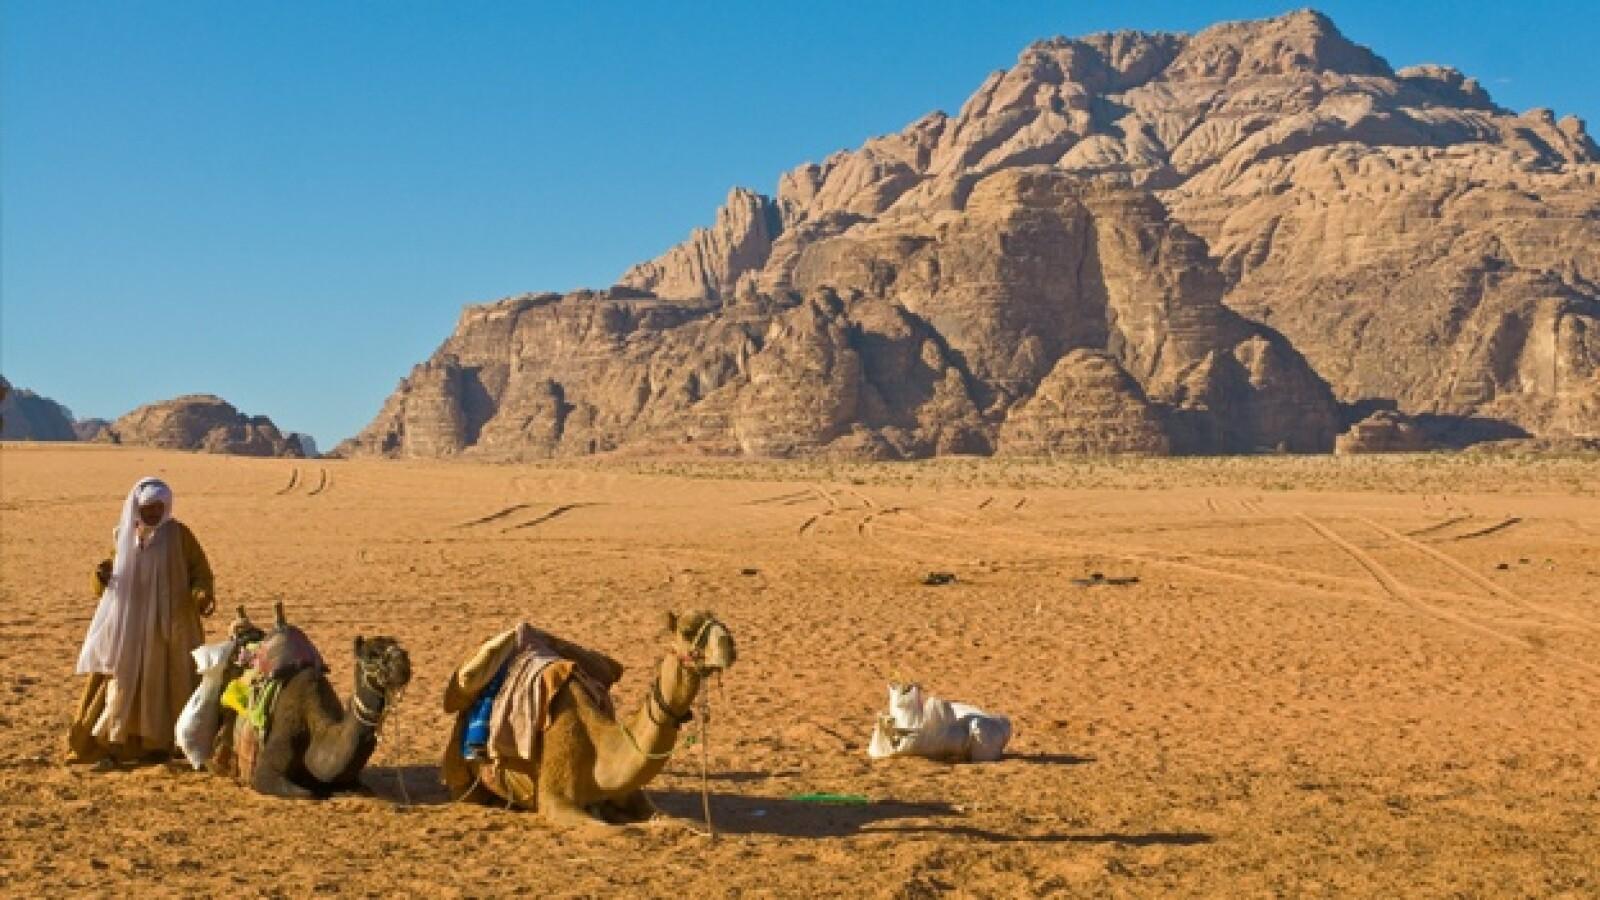 desierto, camello, jordania, unesco, patrimonio